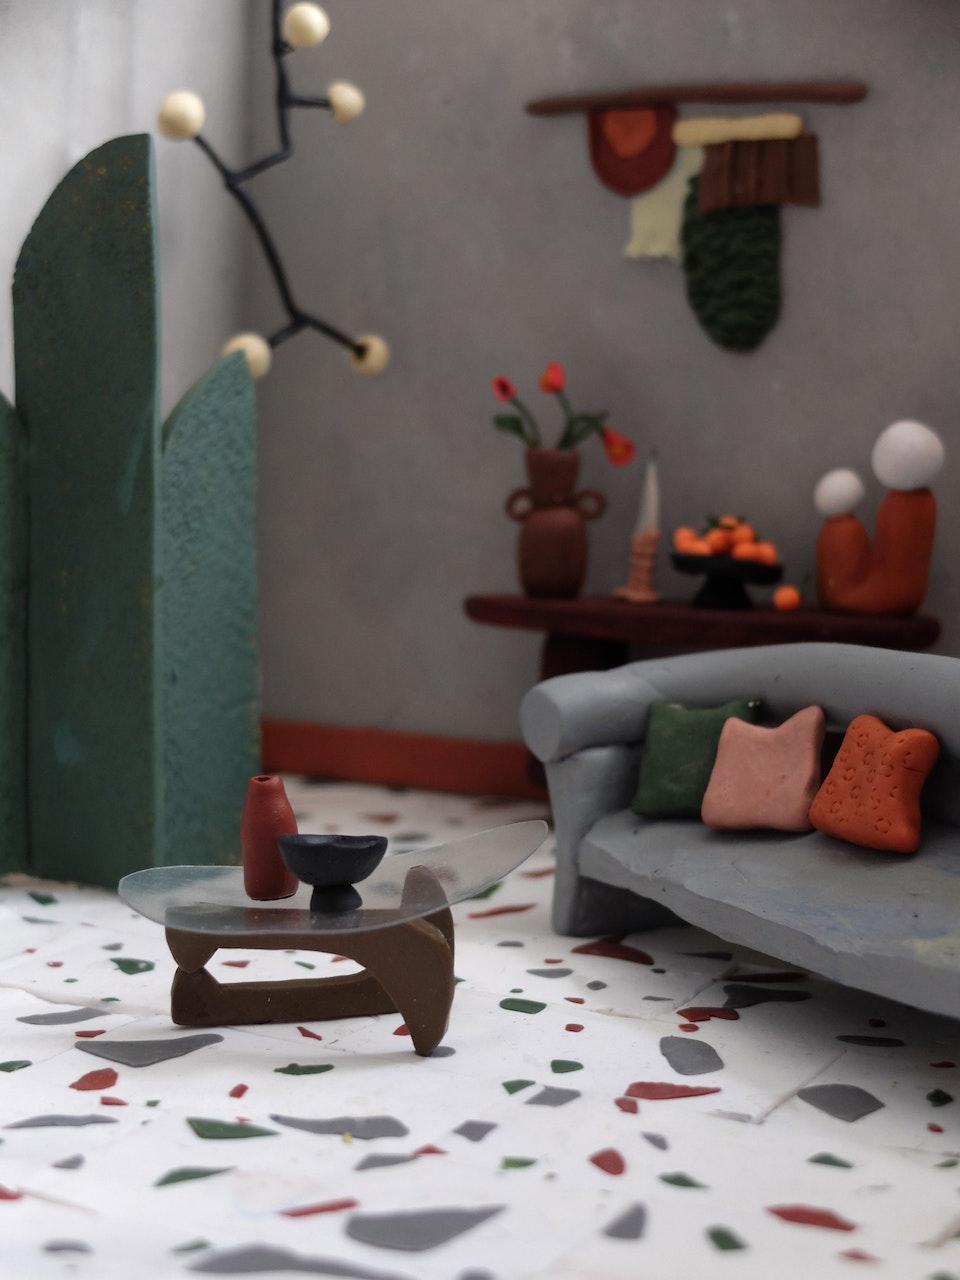 Production Designer: Phoebe Anne Harris: 'Teeny Tiny House of Clay' - DSCF8760